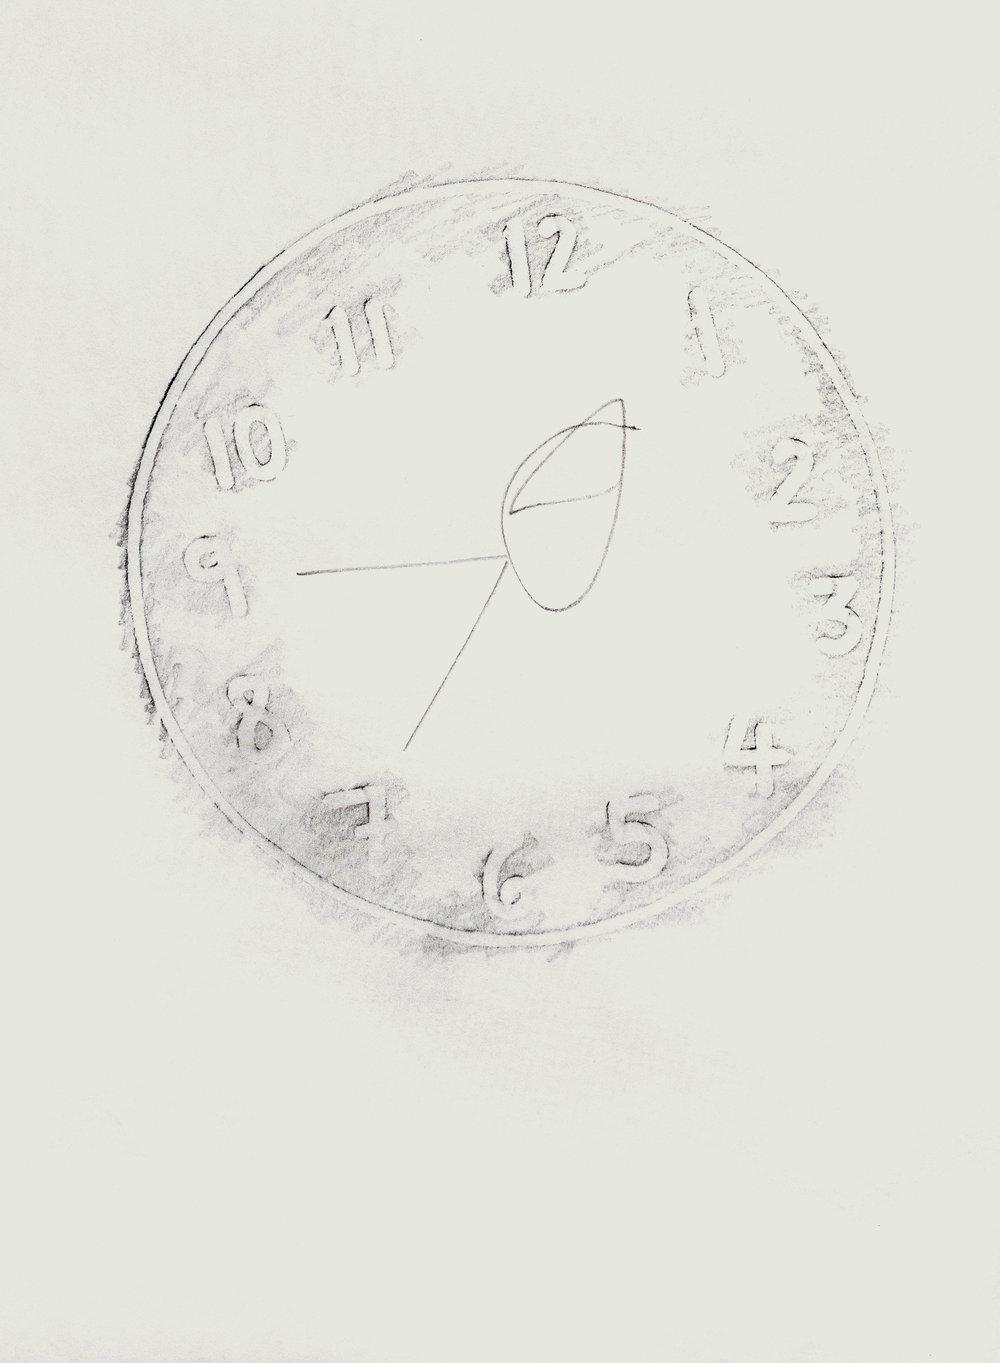 clock_rubbings_0011_Layer 8.jpg